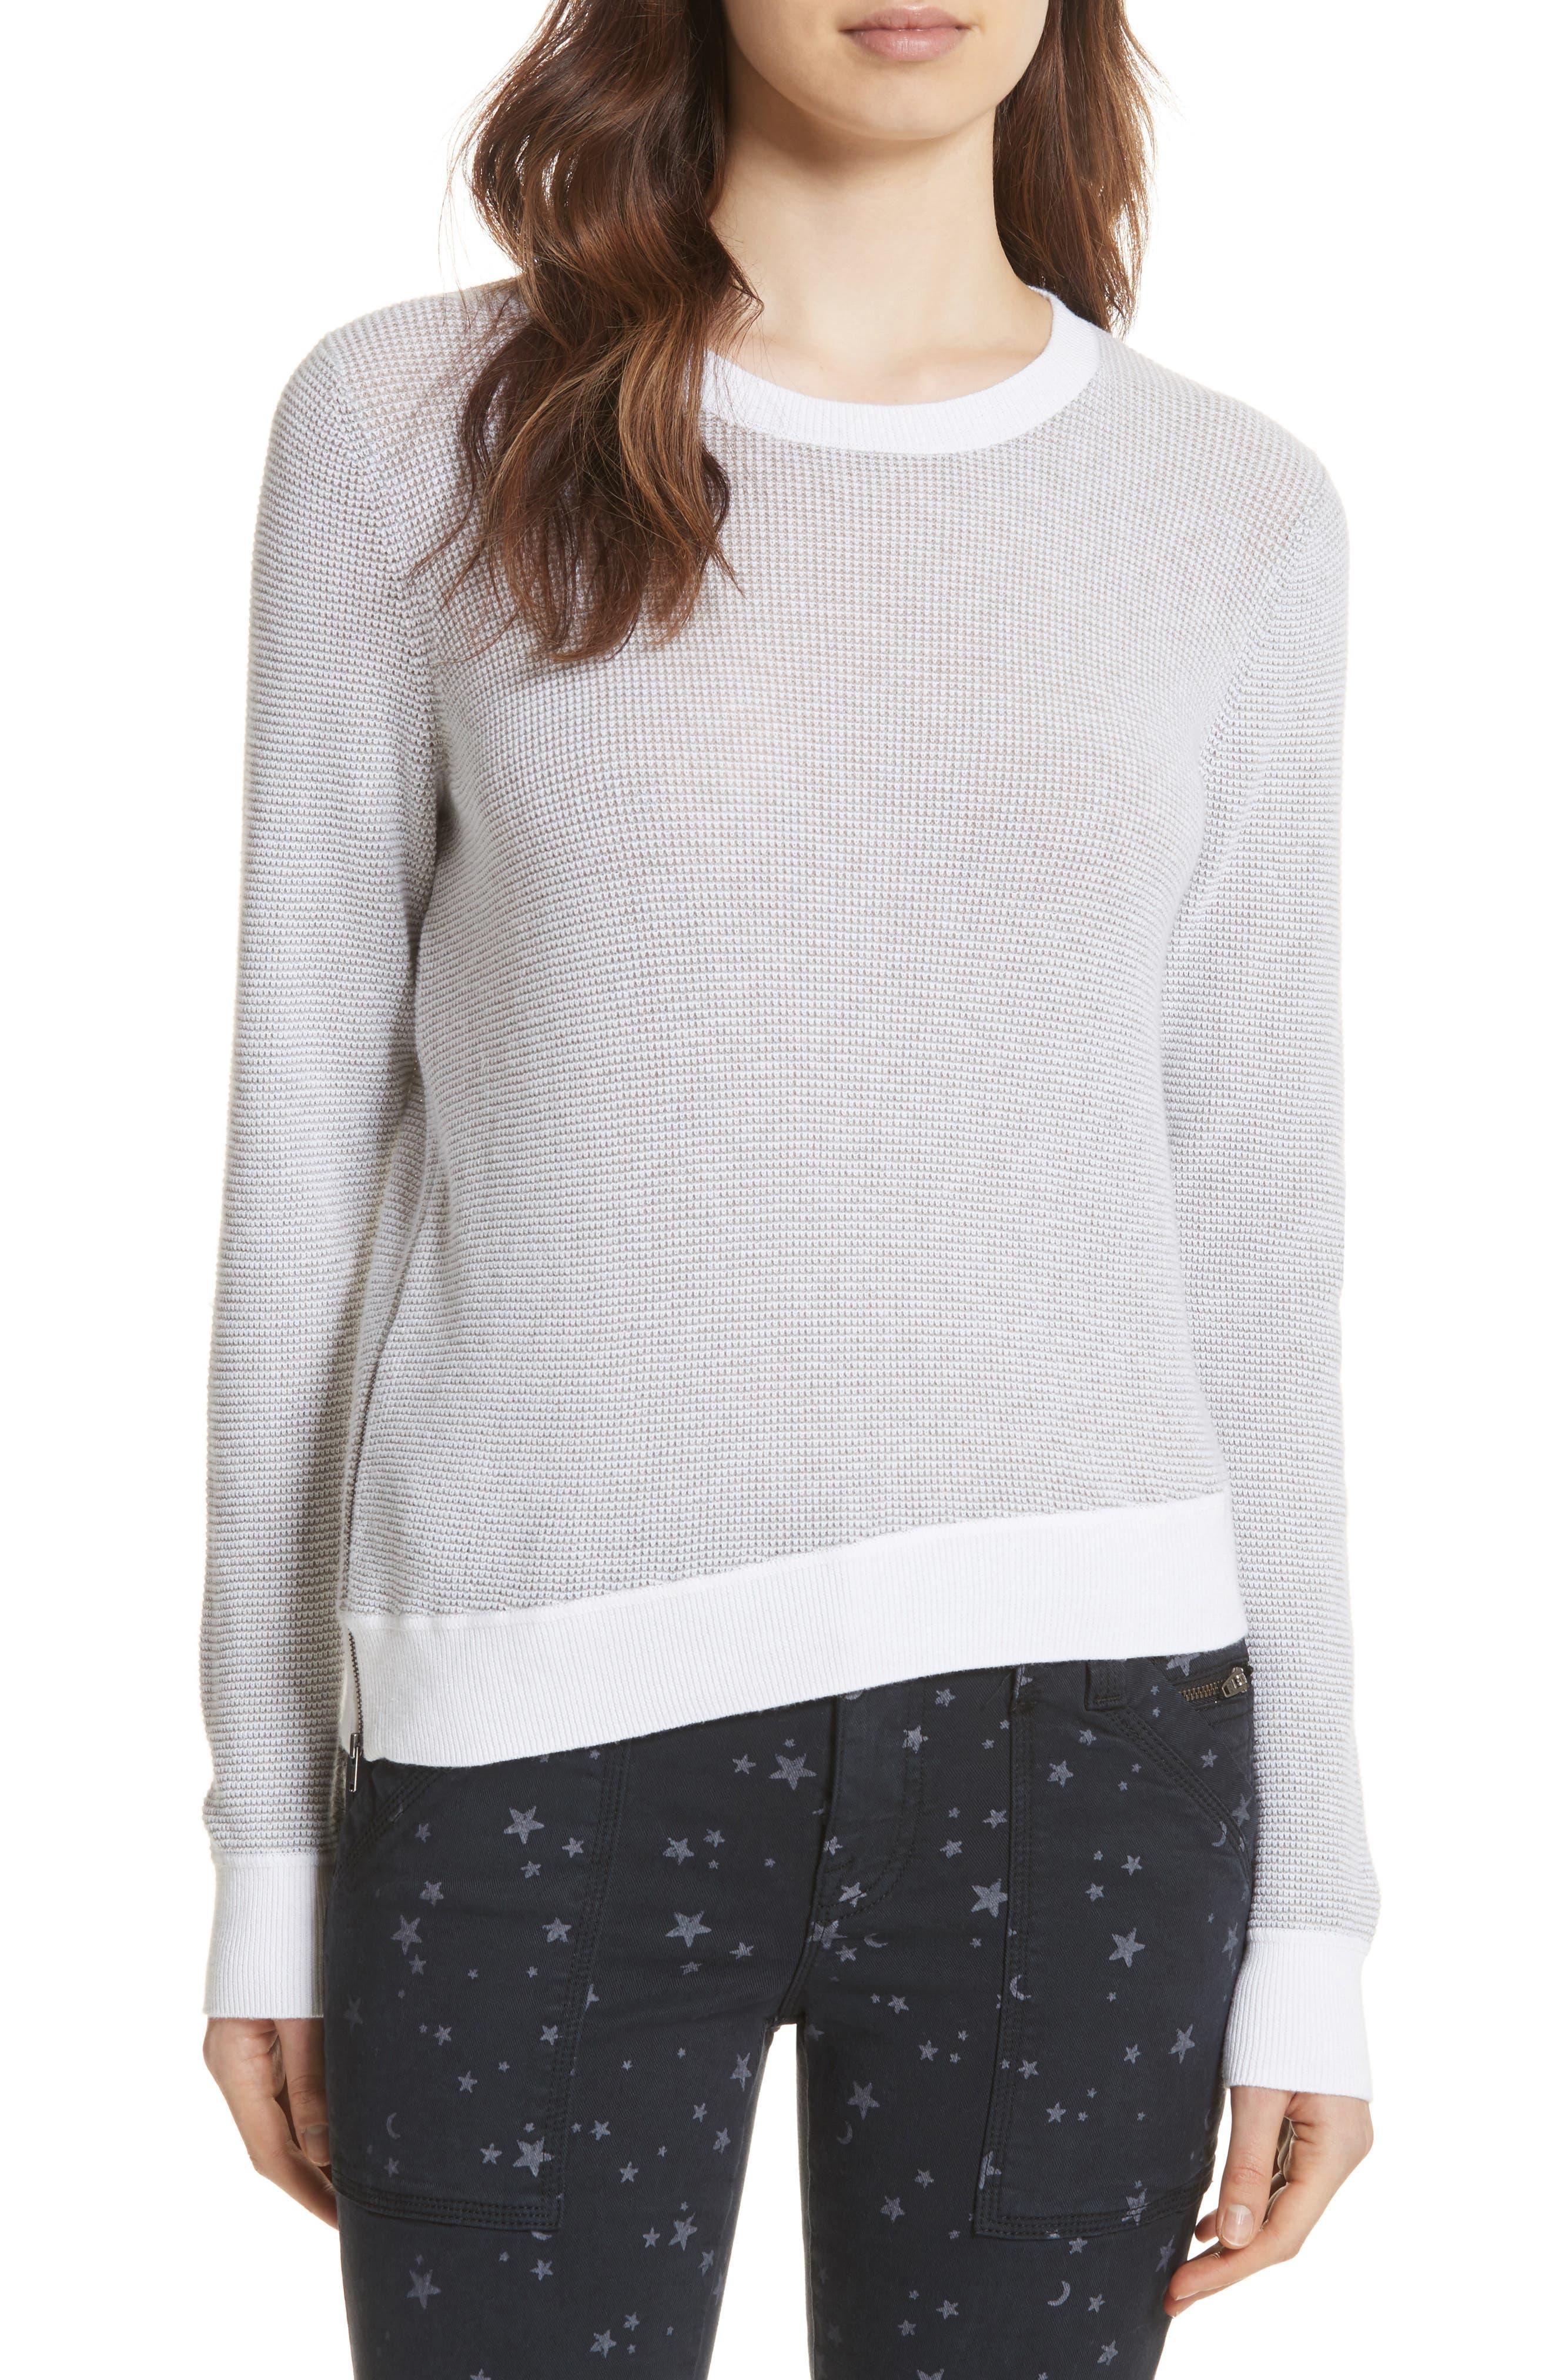 Laurana Cotton & Cashmere Sweater,                         Main,                         color,